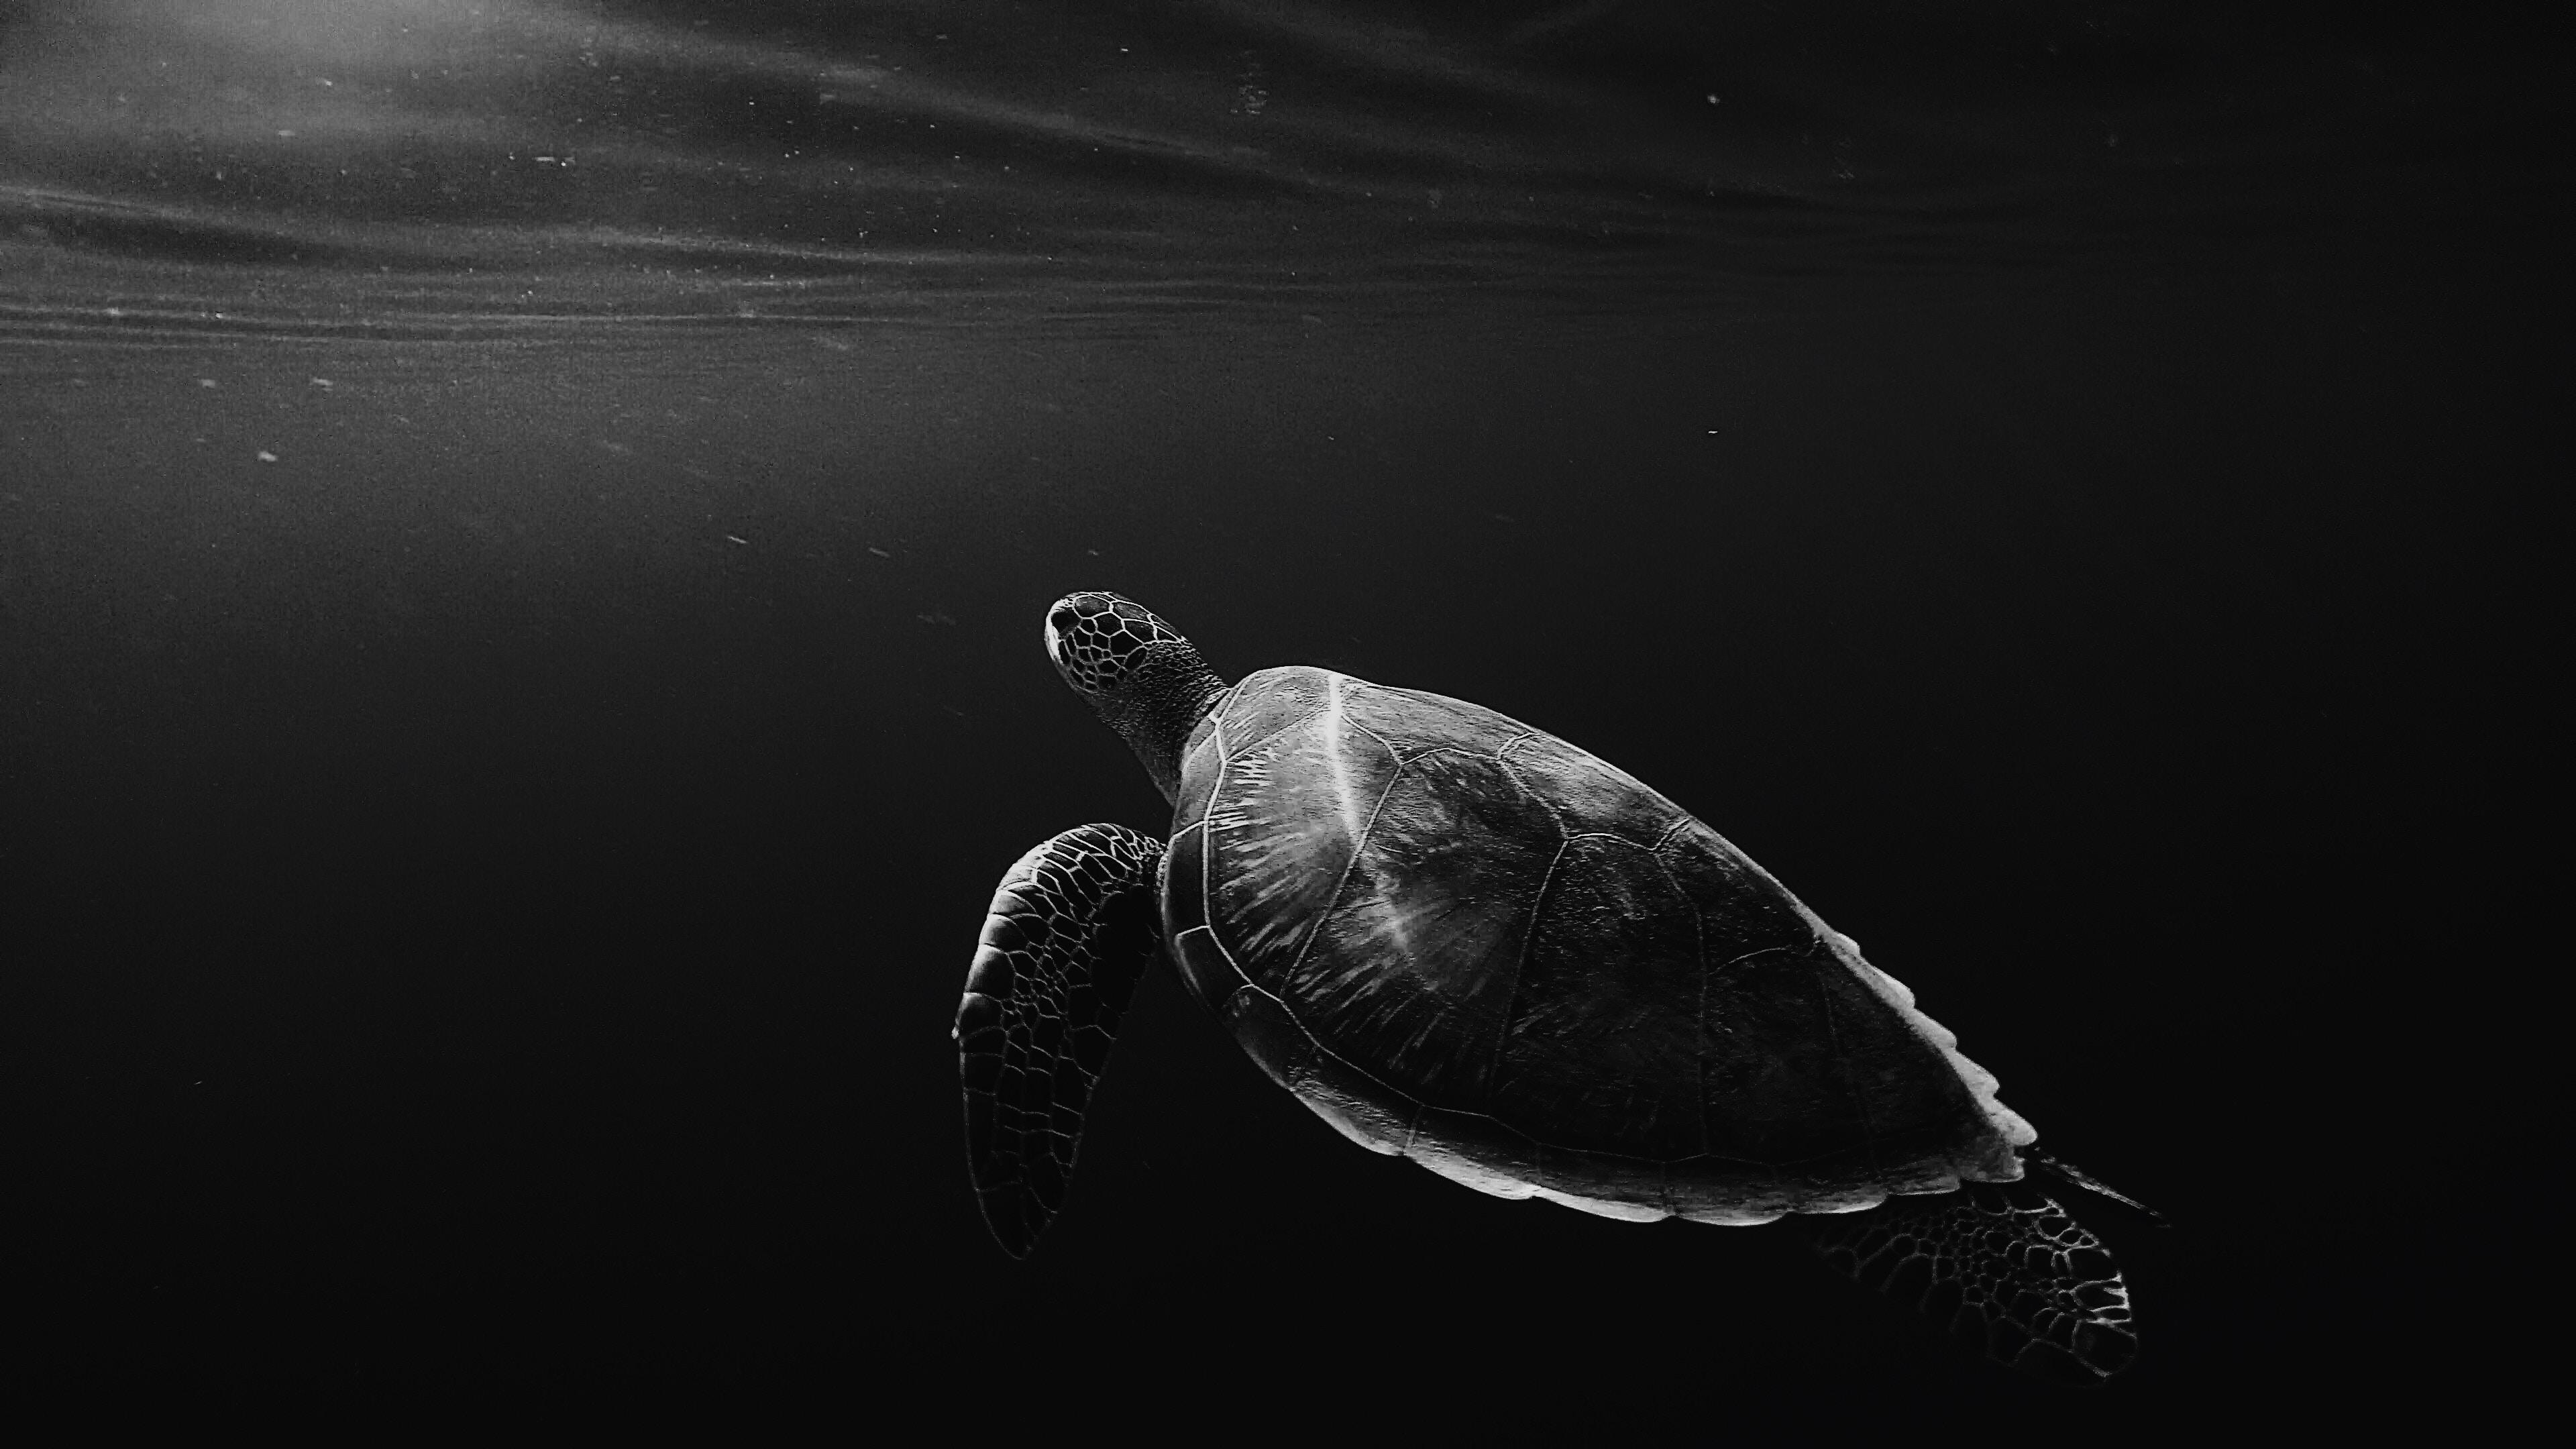 Meeresschildkröte auf unsplash.com